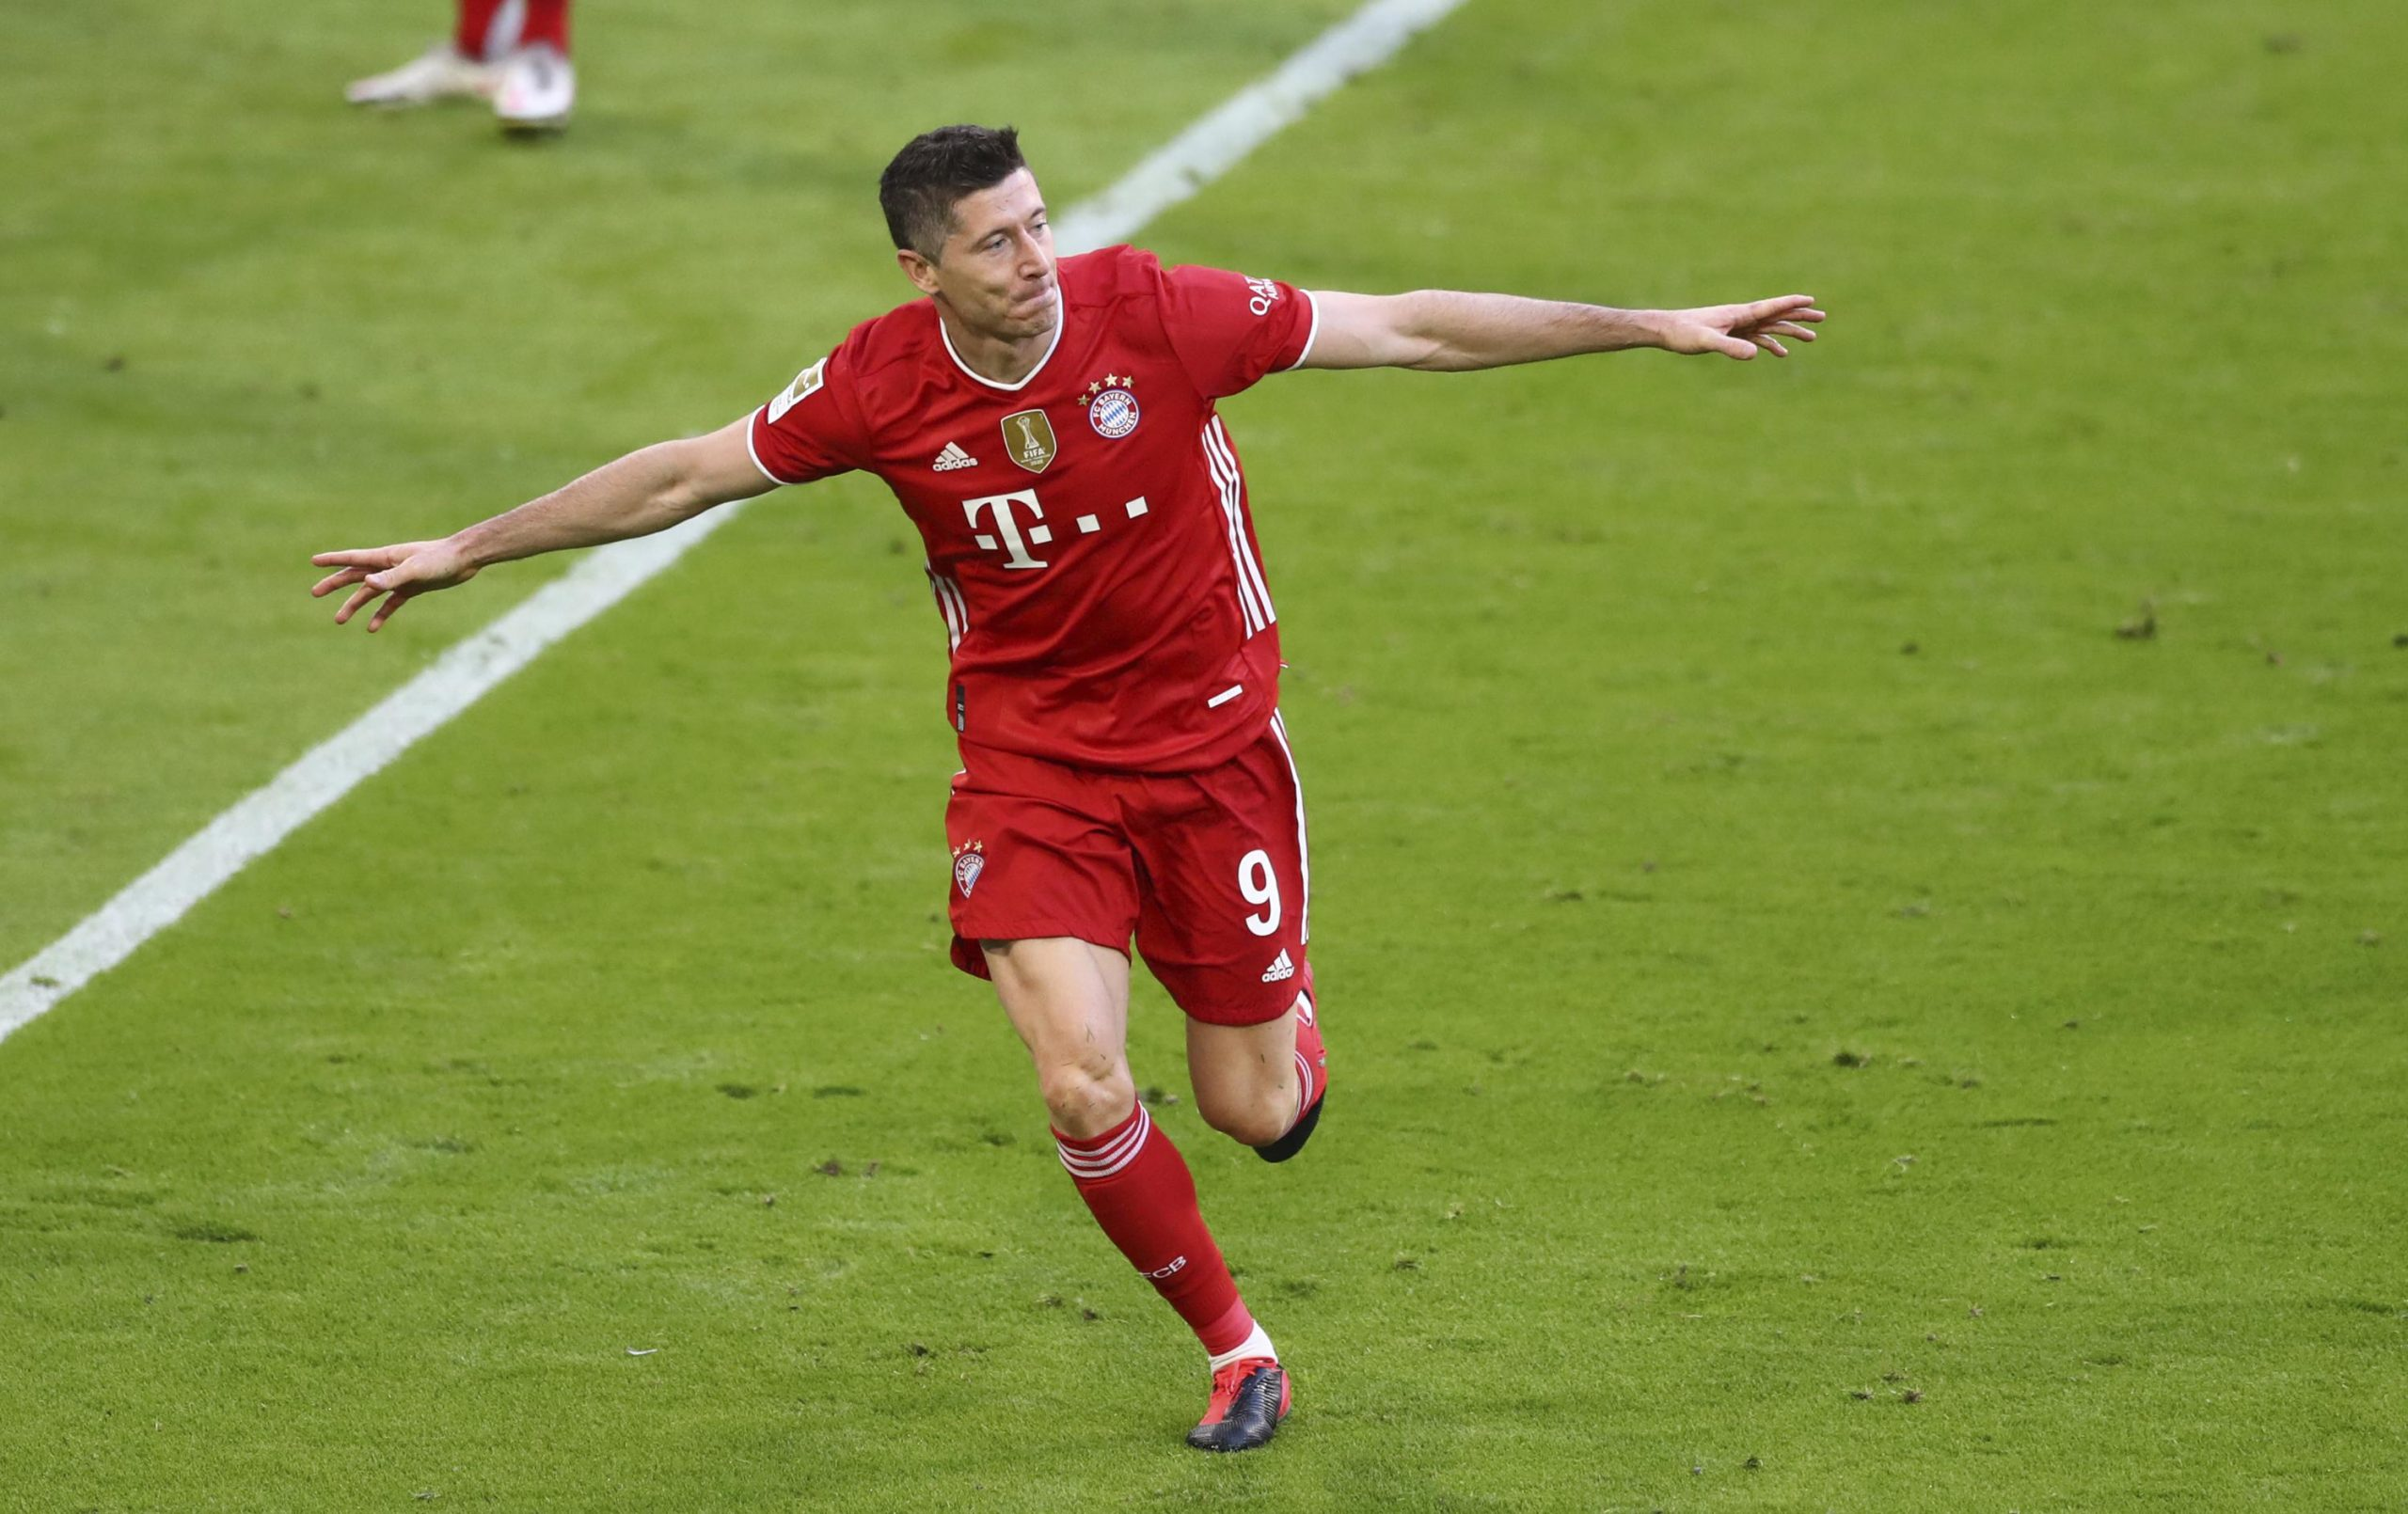 Bundesliga 2021-2022 Schedule Sees Bayern Play Monchengladbach in Opening Round